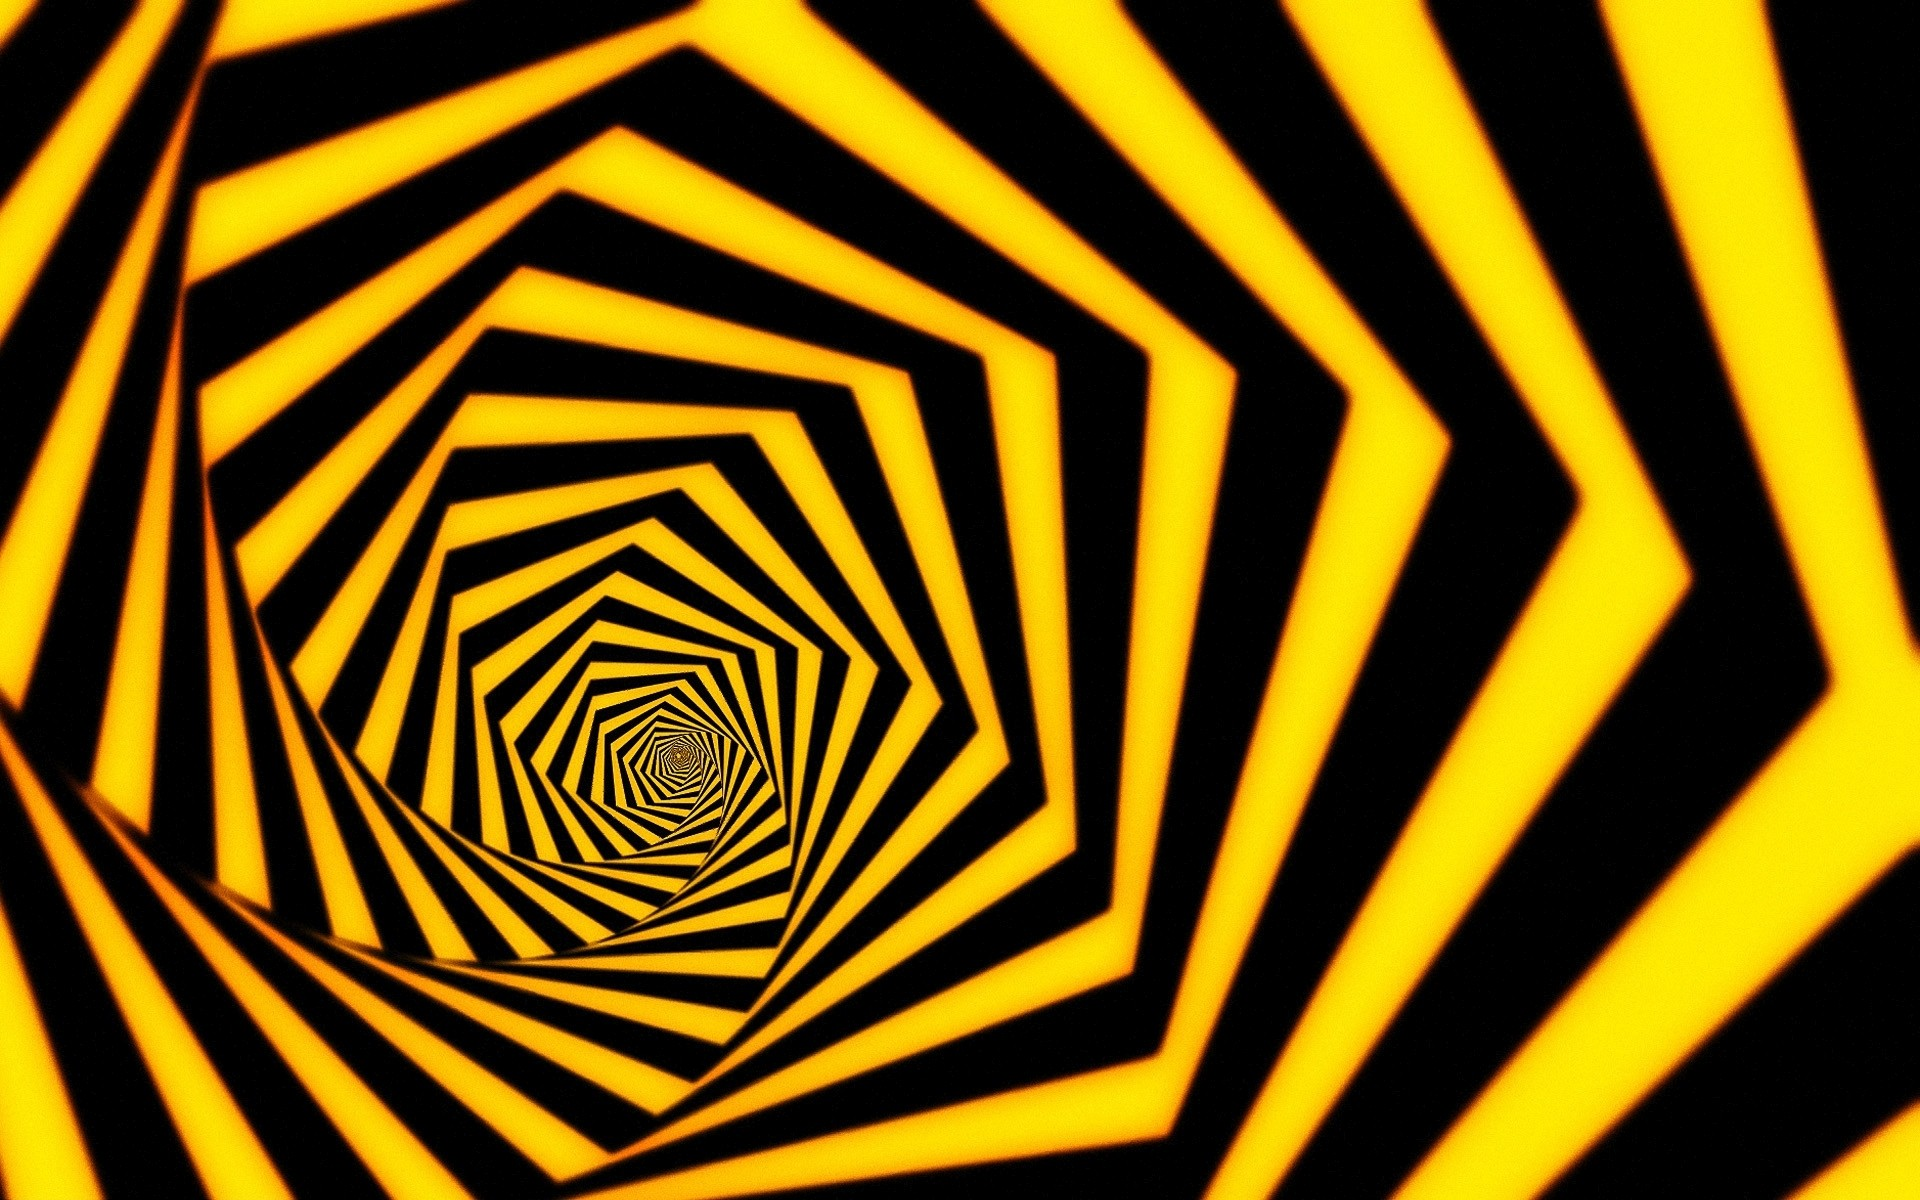 Hypnosis wallpaper